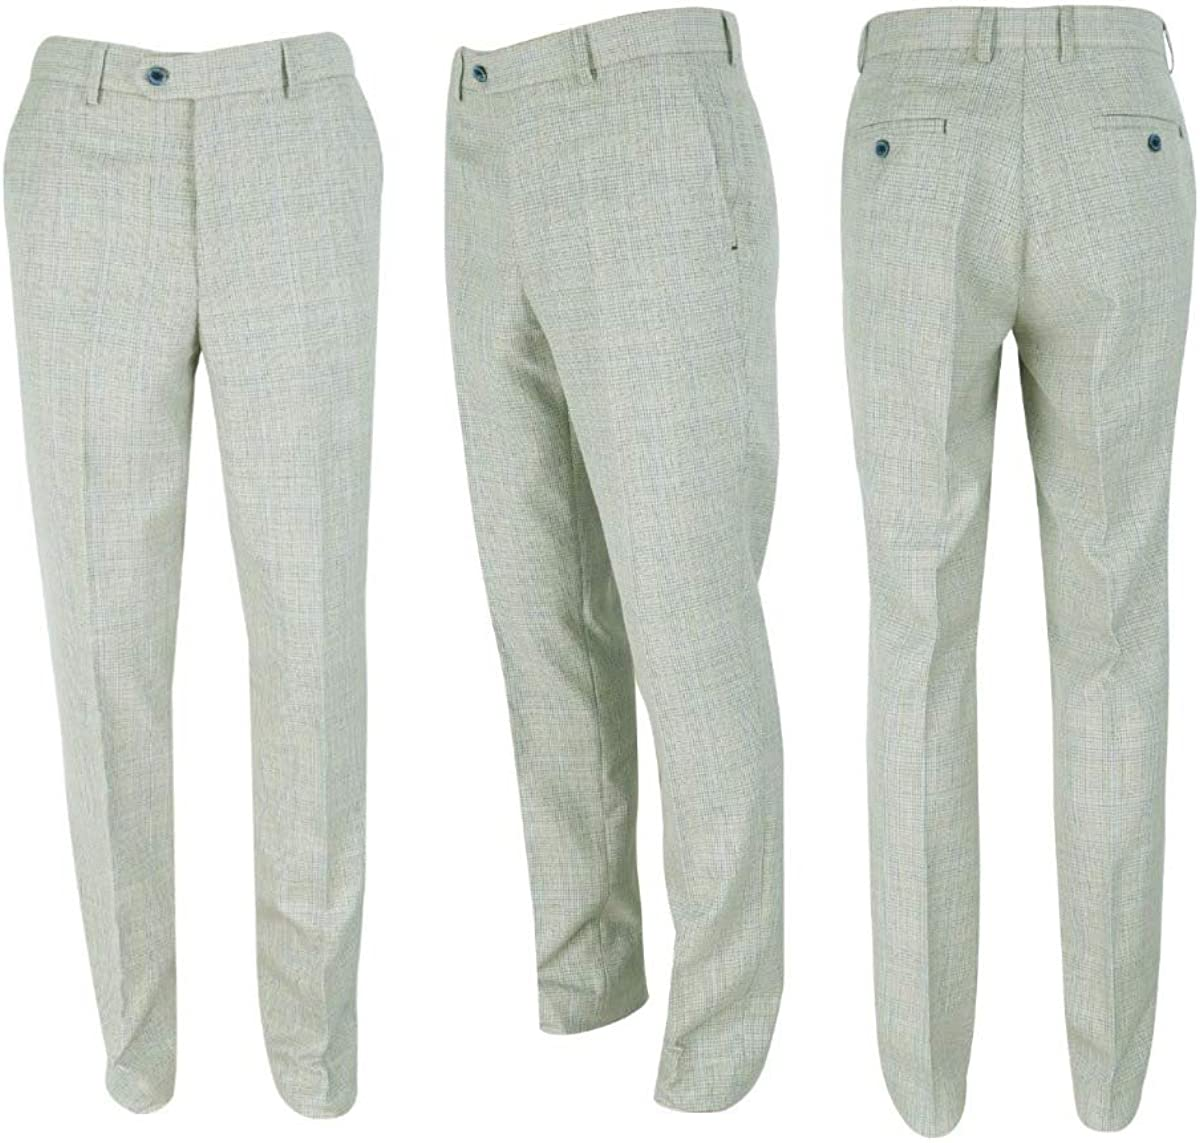 Men's Slim Fit Tweed Suit Blazer Vest Pants Sold Separately Retro Houndstooth Check Pattern in Beige